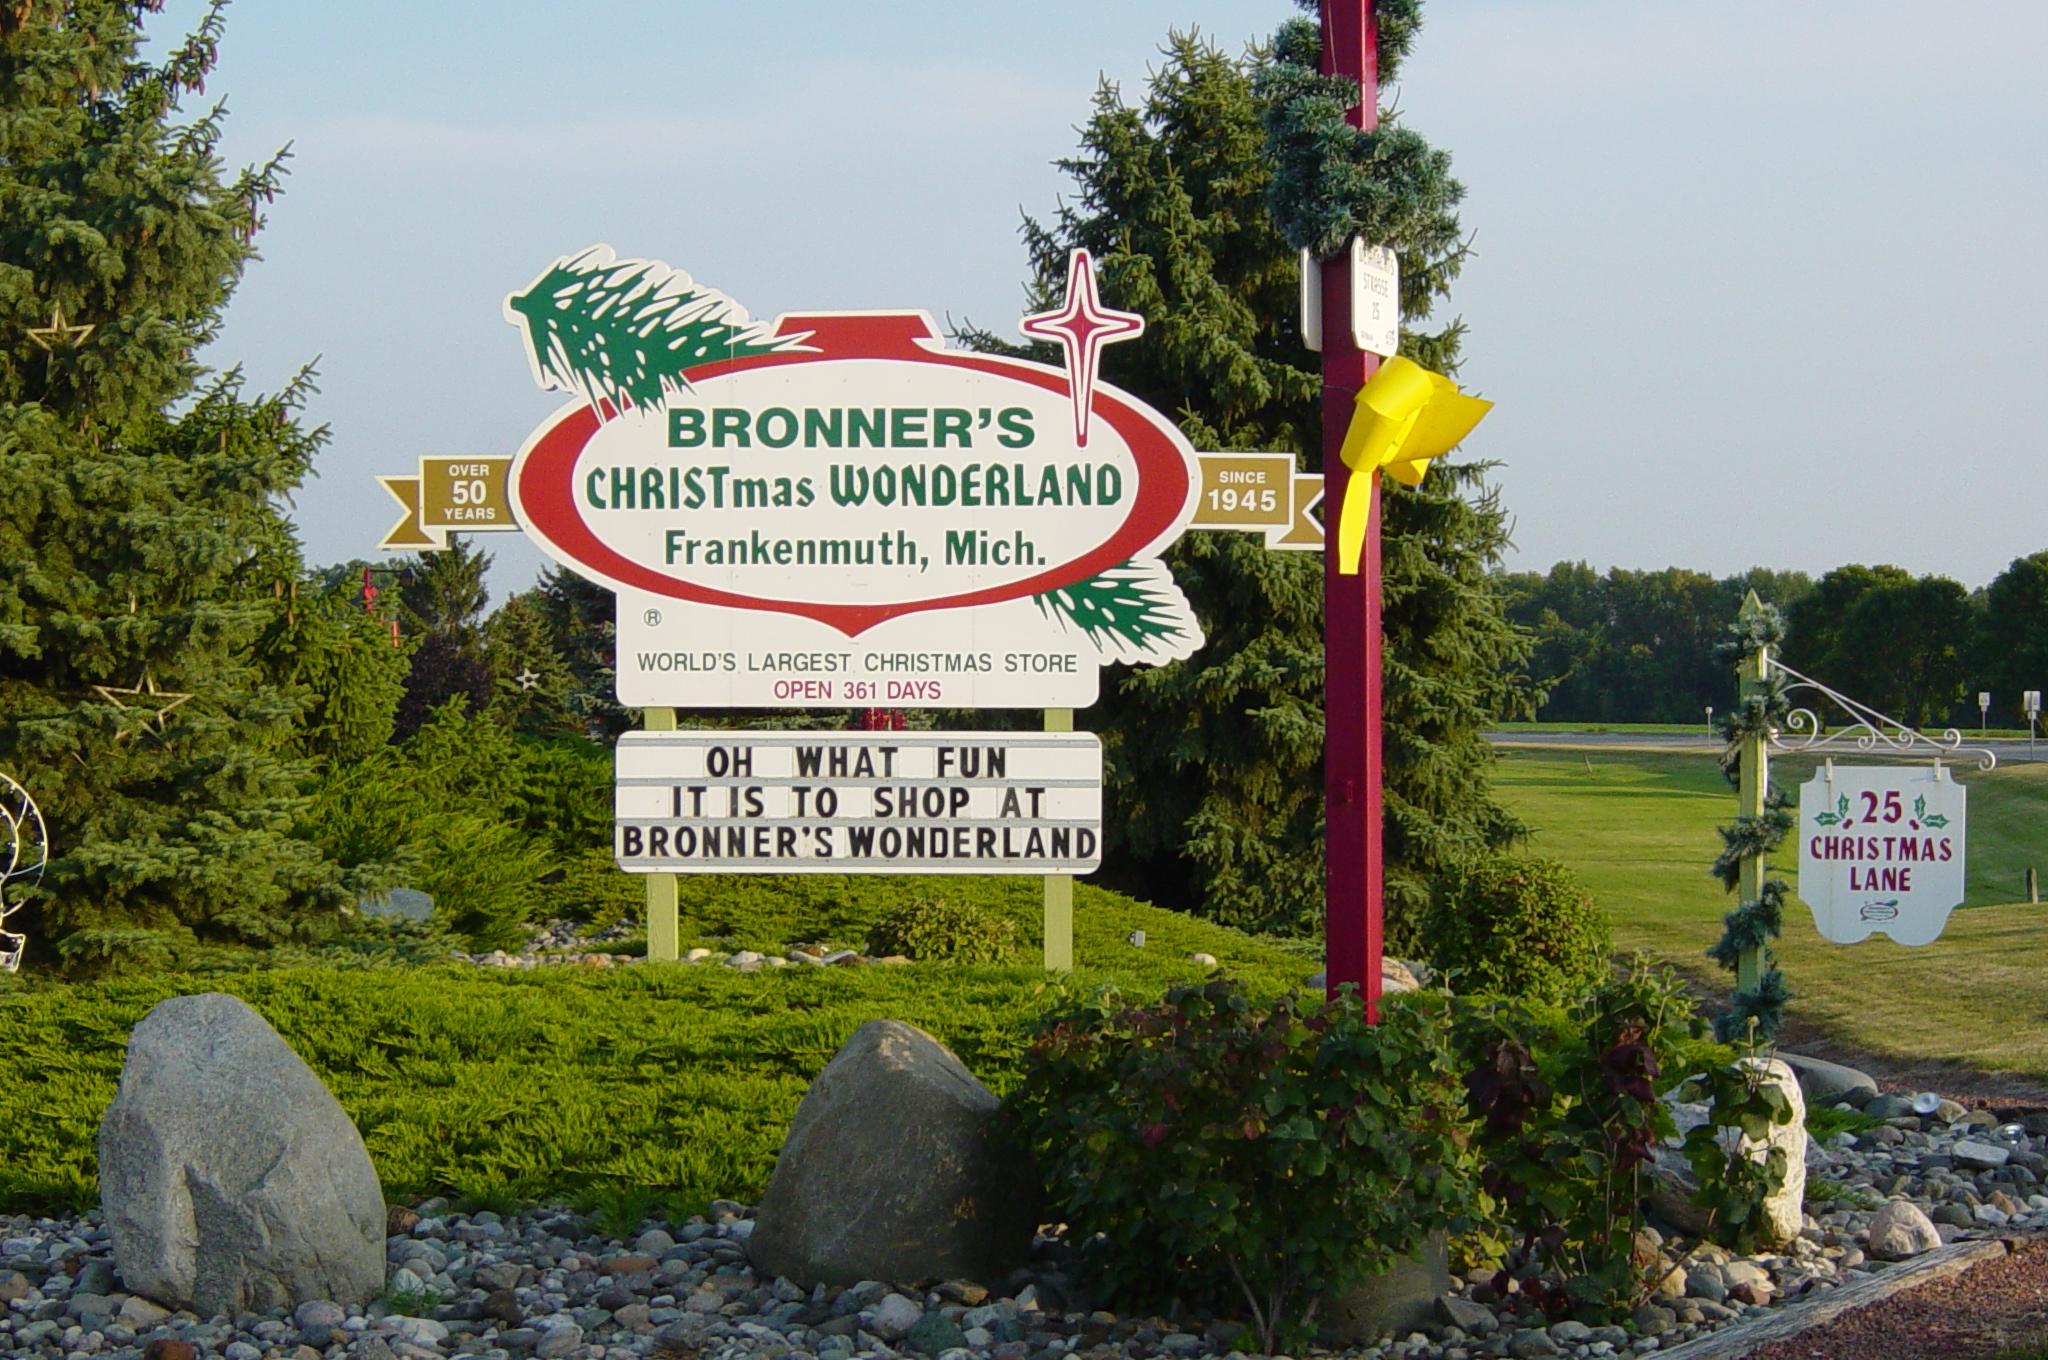 Bronner's Christmas Wonderland Sign At